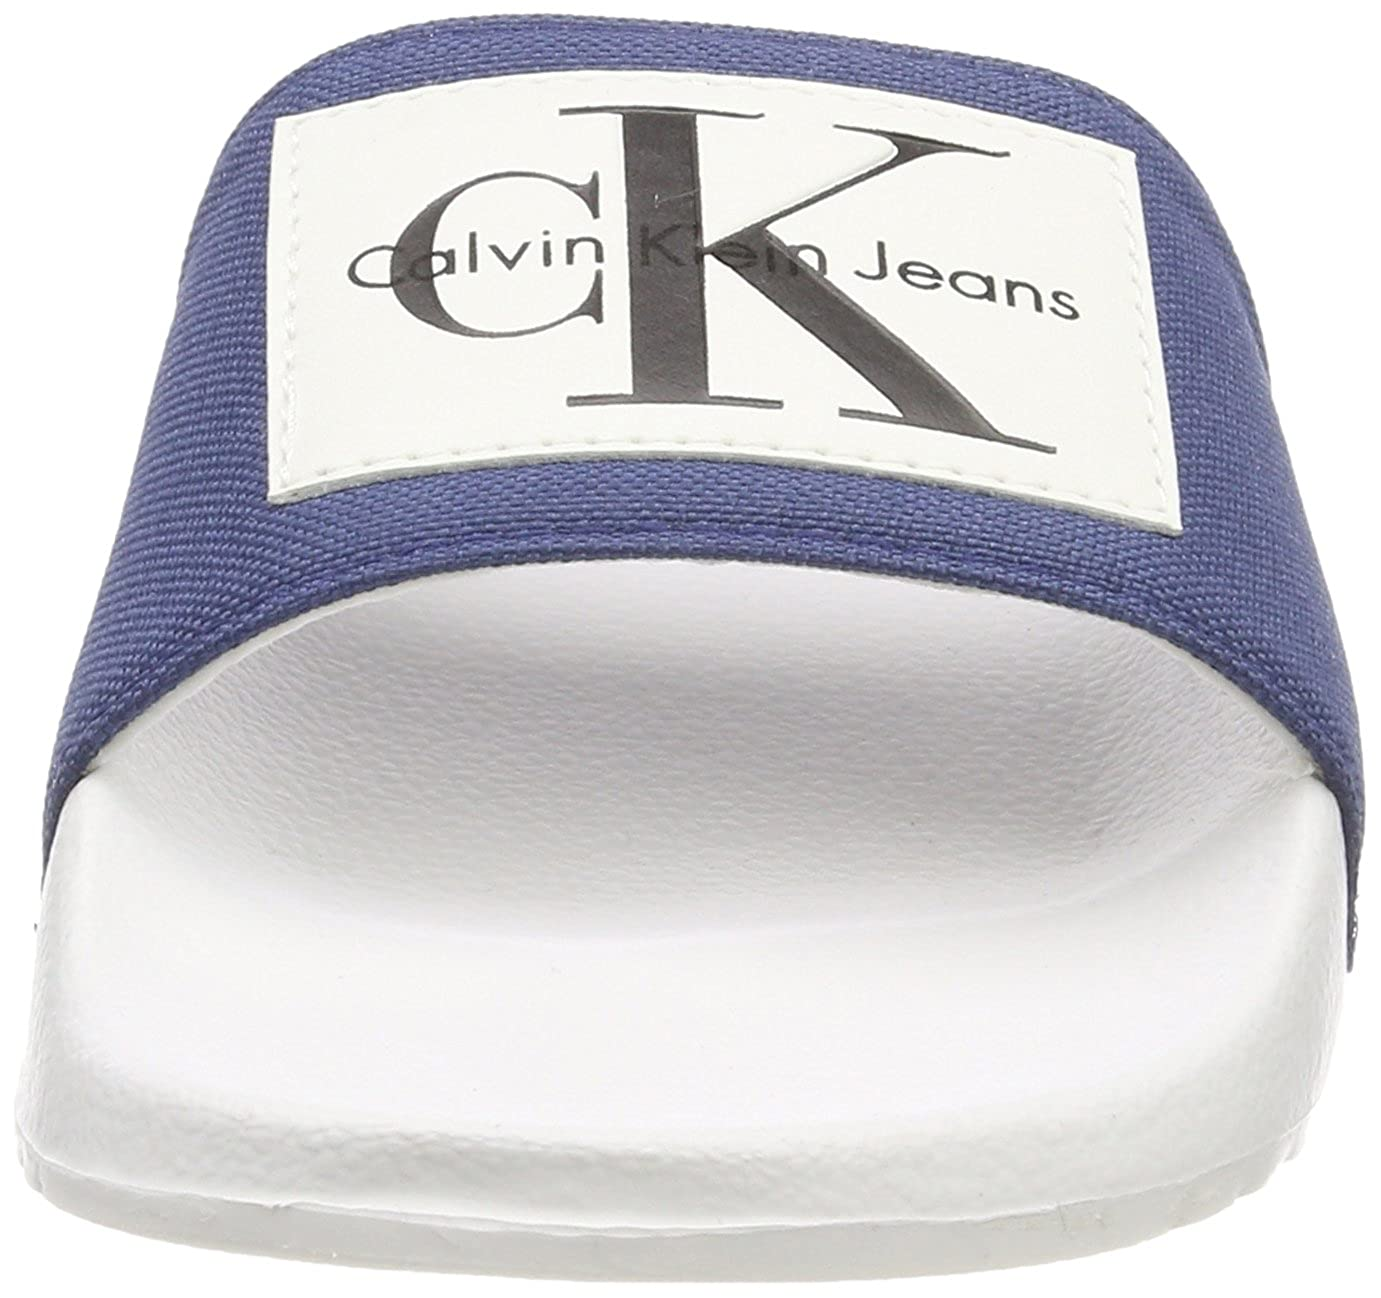 Calvin Klein Jeans Damen Chloe Nylon Peeptoe Peeptoe Nylon Sandalen Blau (Stb 000) 86e320